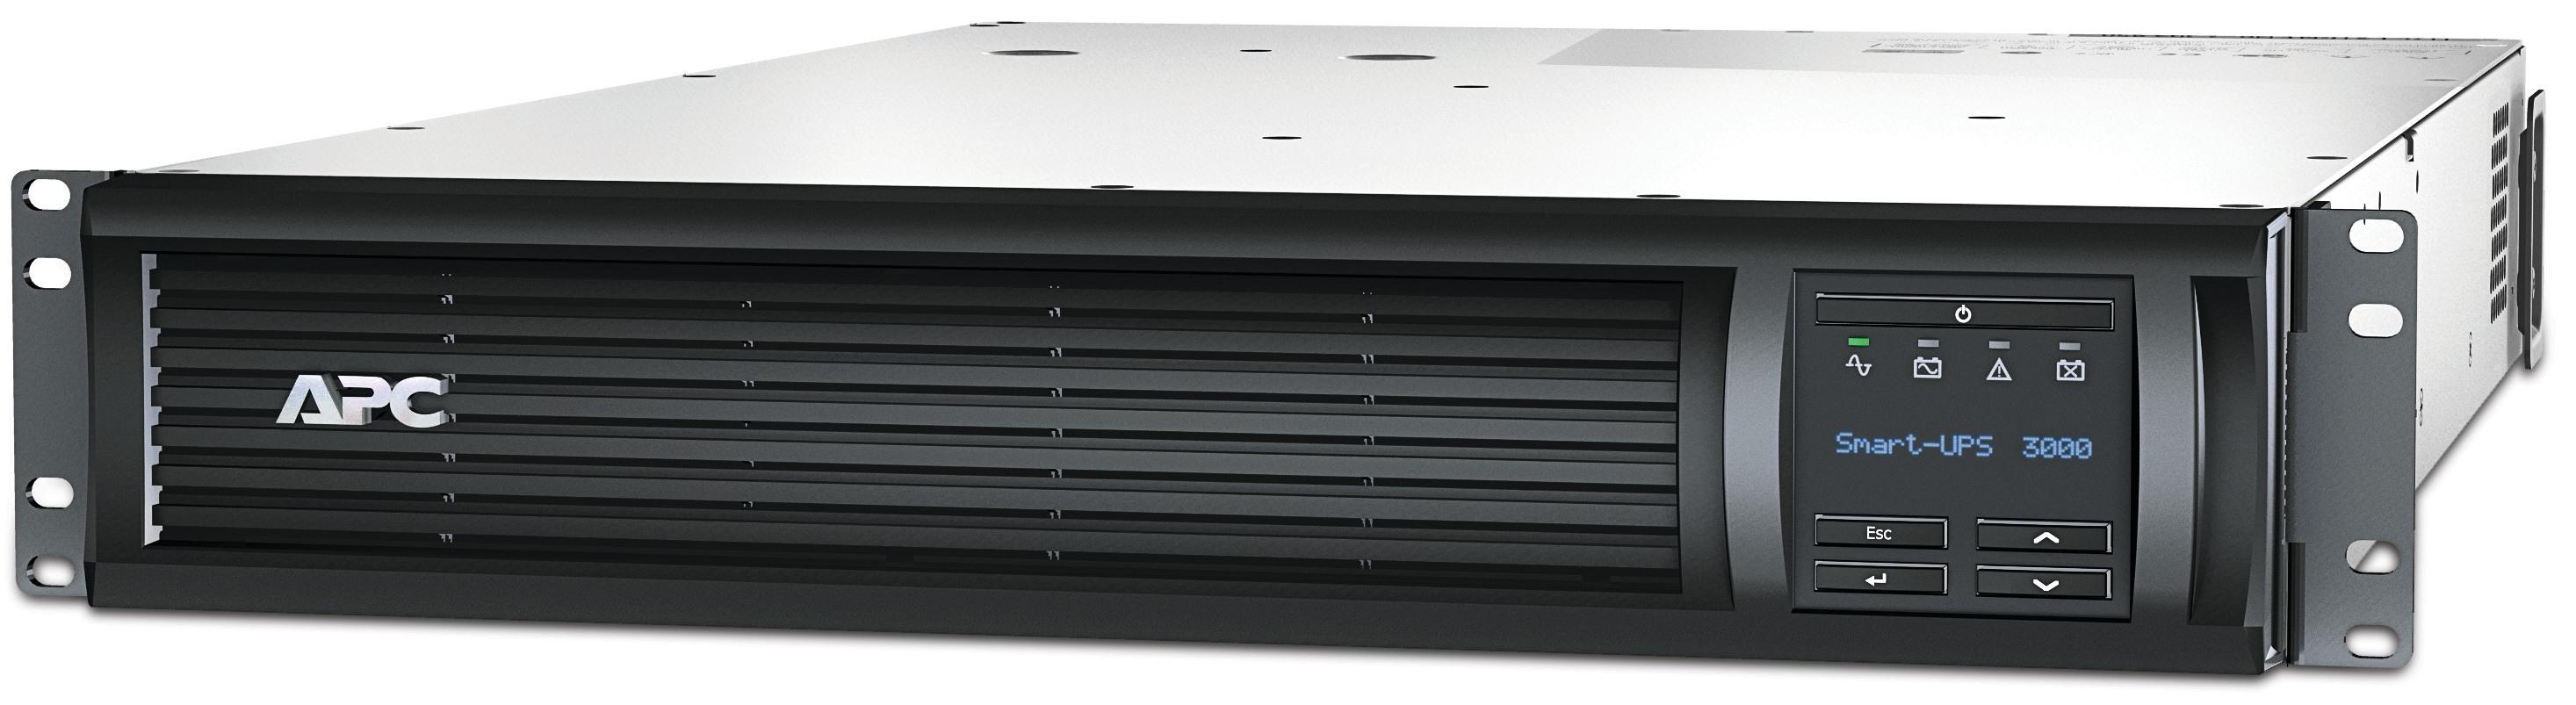 APC-by-Schneider-Electric-Smart-UPS-SMT3000RMI2UNC